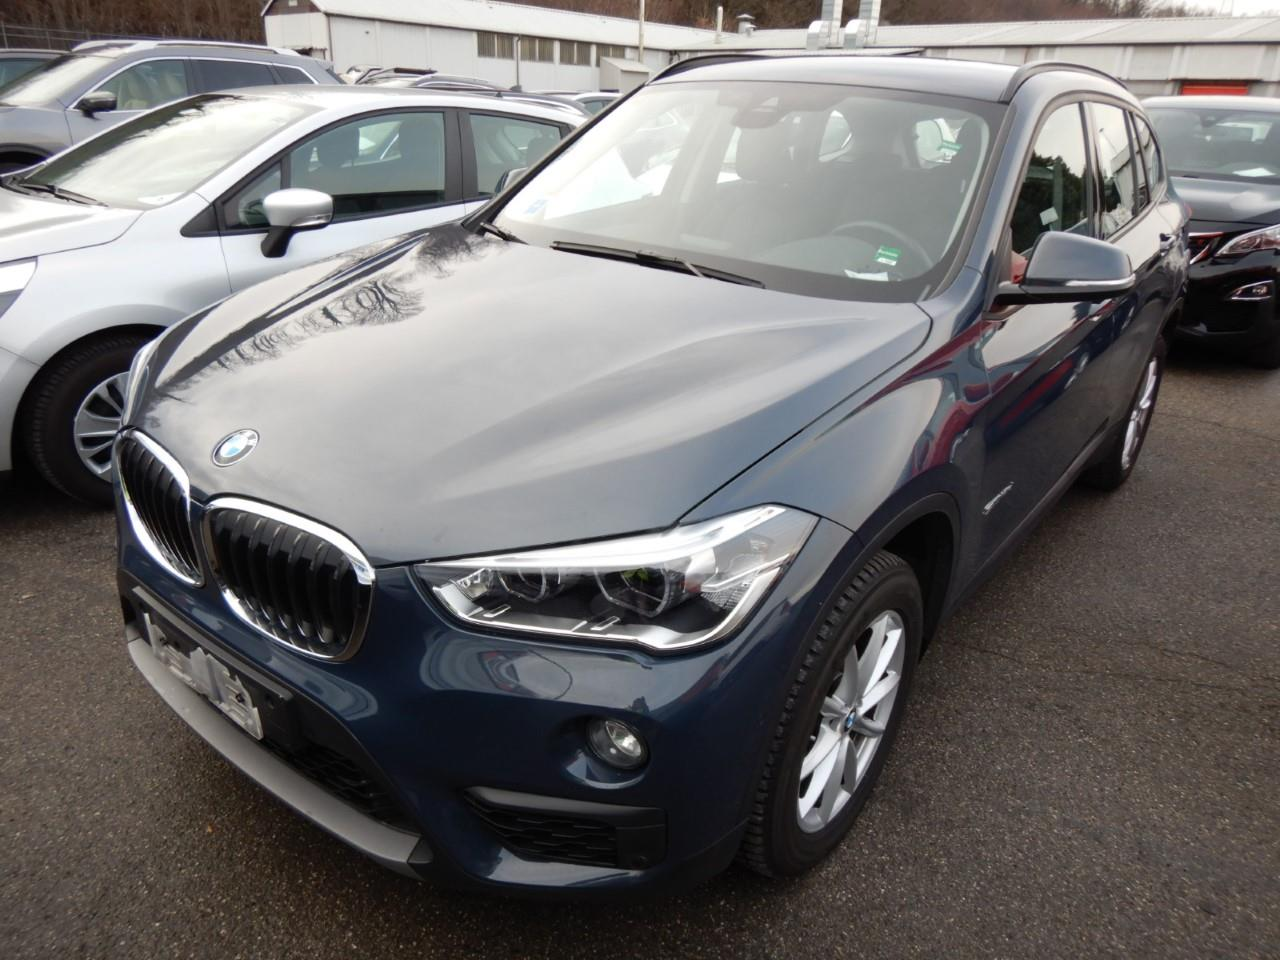 BMW X1 18d 150cv steptronic e6 ss s-drive advantage ( cruise - navi - bluetooth - clima bizona - fari led - pdc ) km 41000